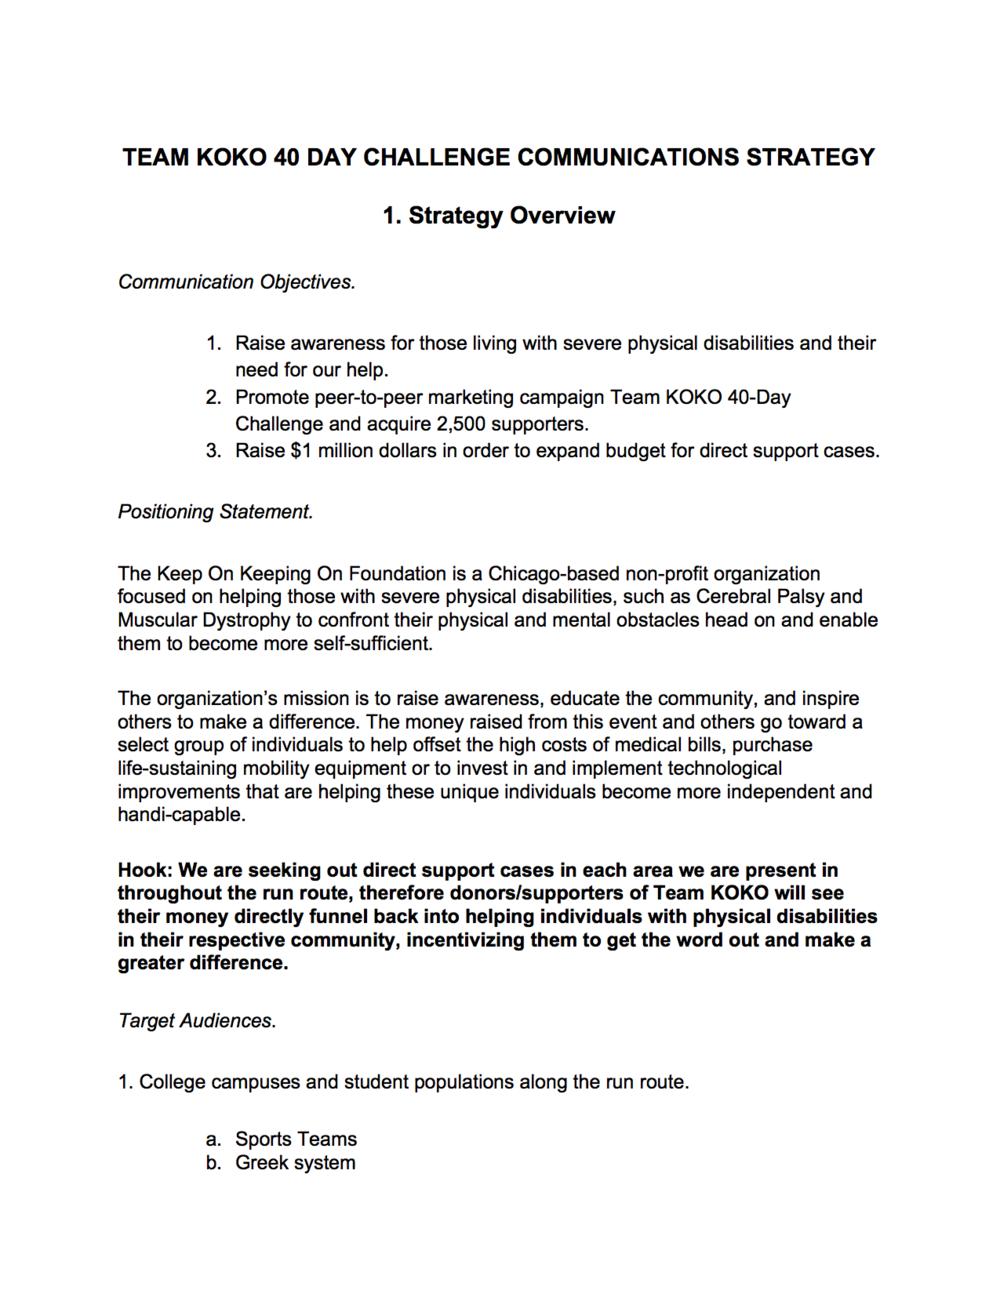 KOKOCommunicationsStrategy.png